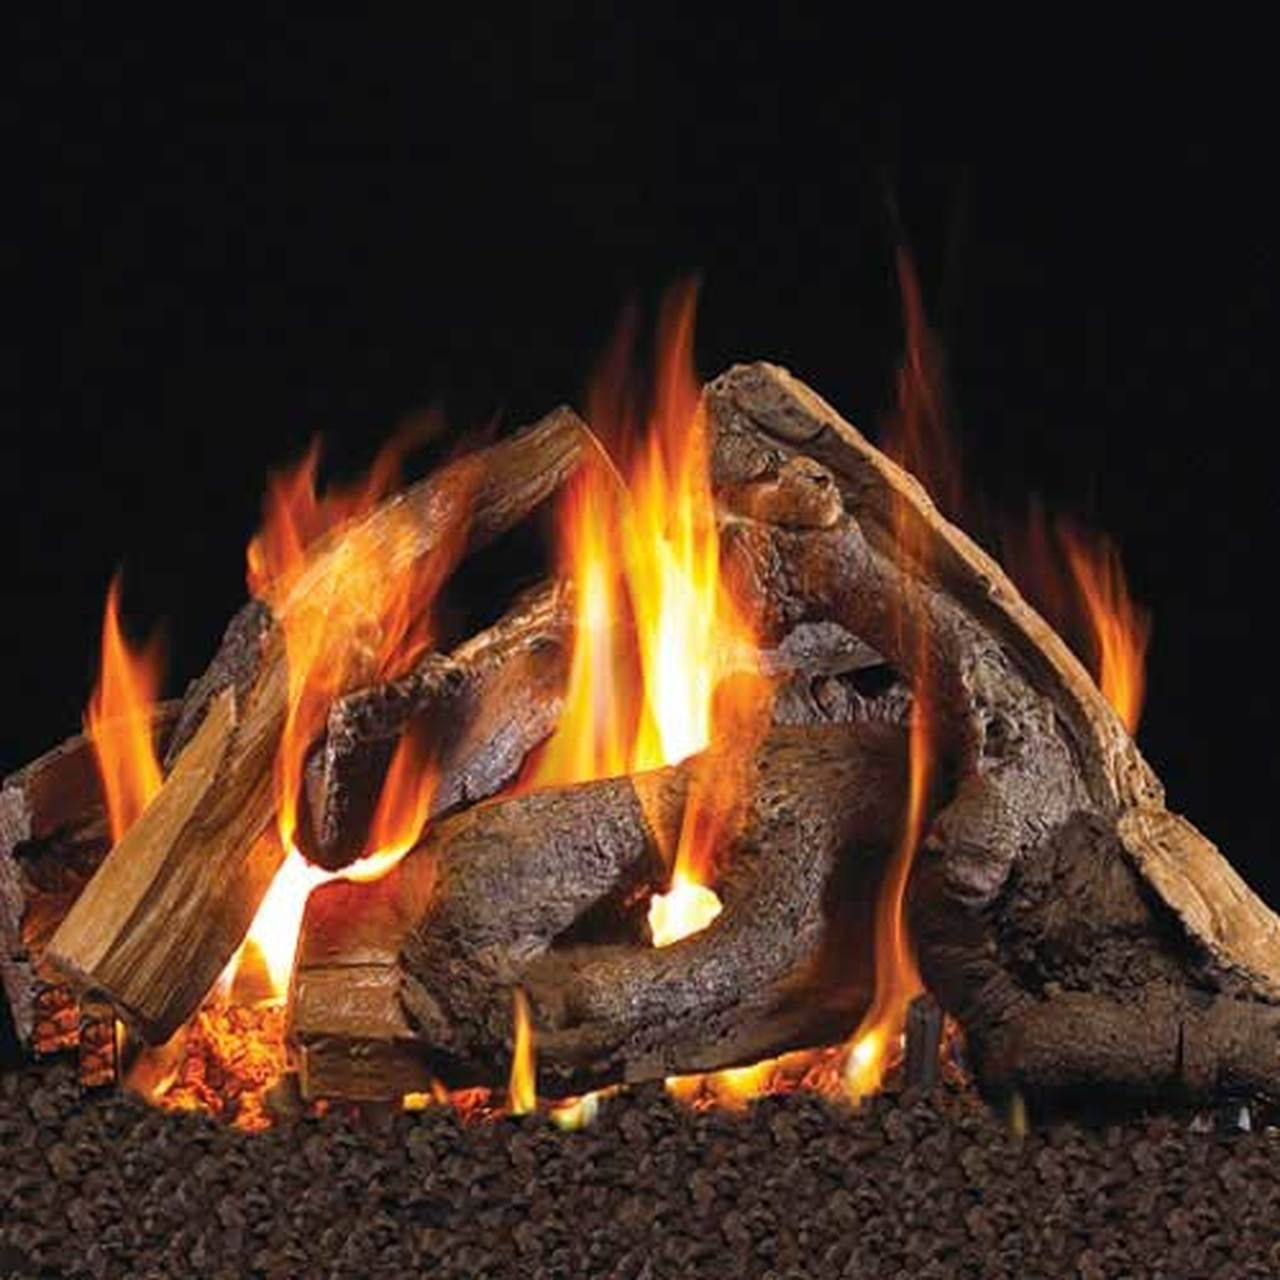 Woodstack Fire Pit Logs Fire Pit Logs Gas Log Sets Gas Logs